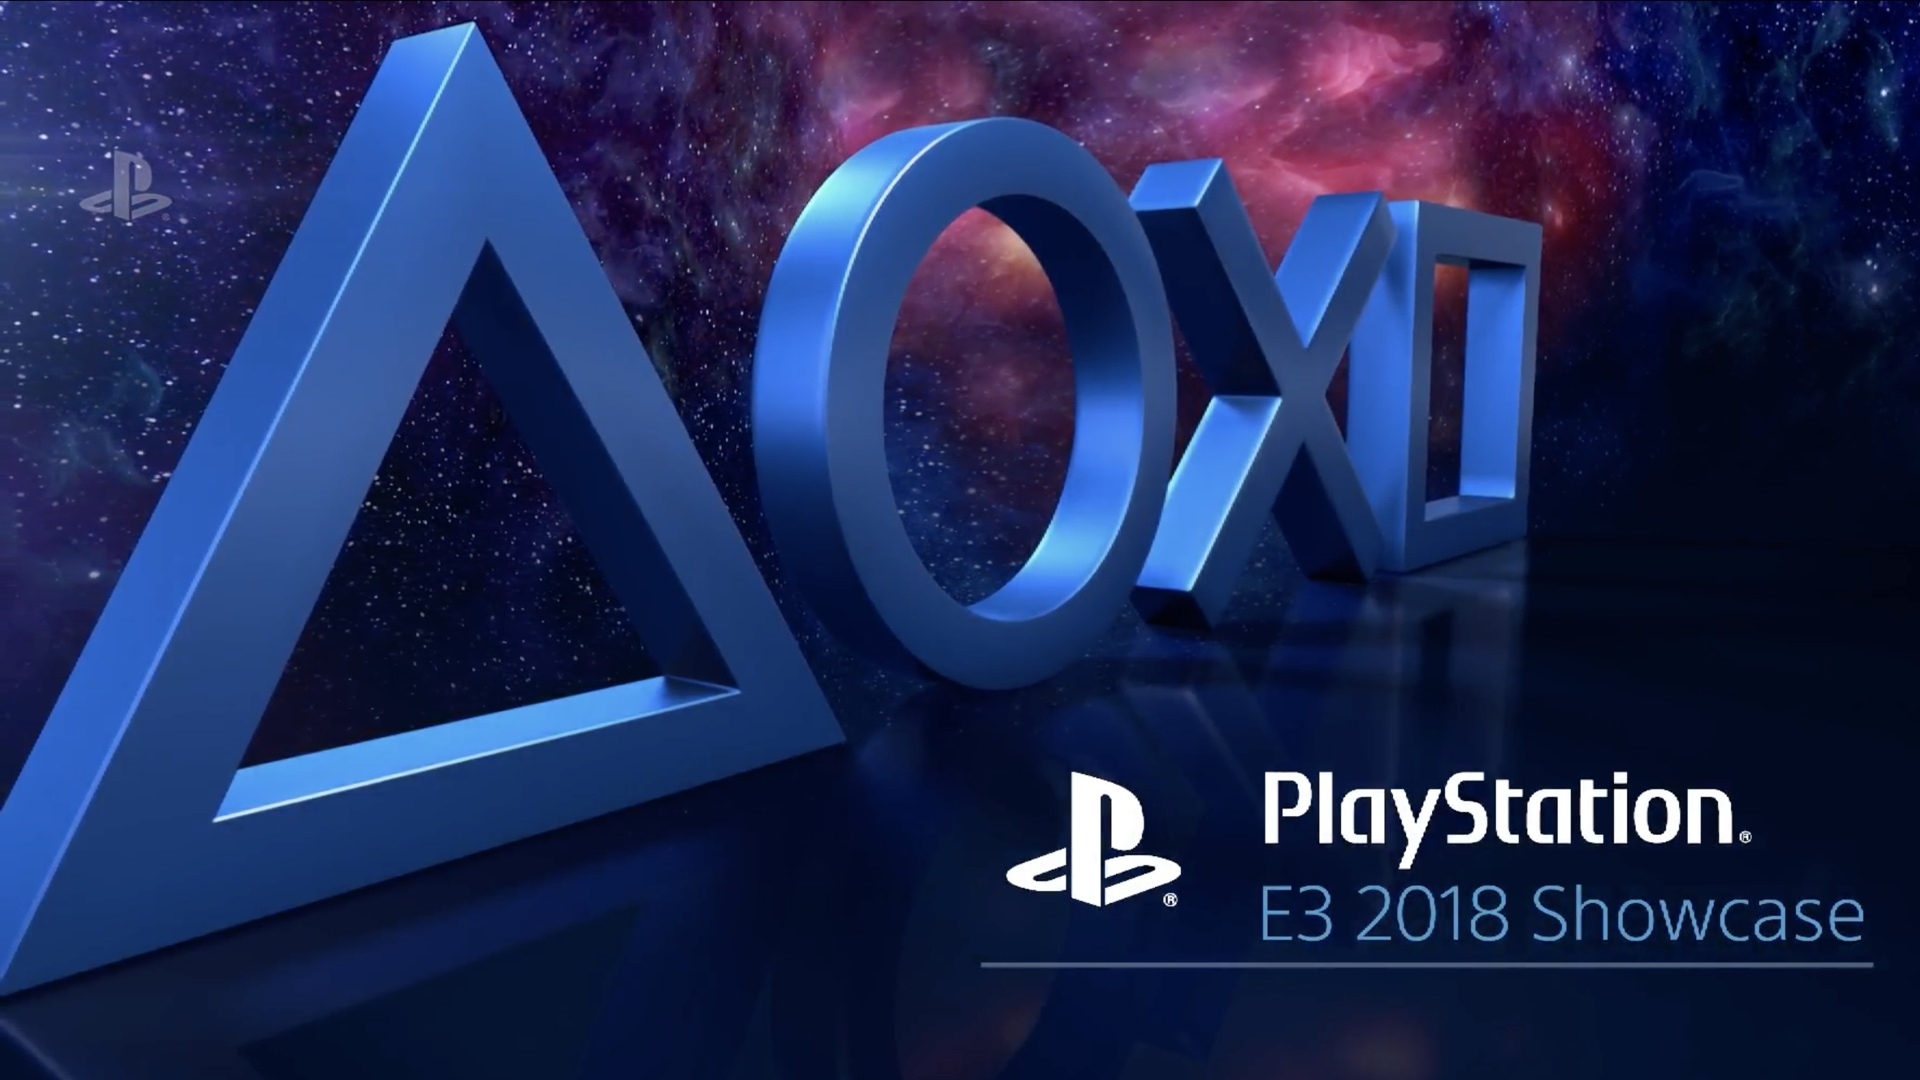 Playstation-E3-Showcase-1.jpg